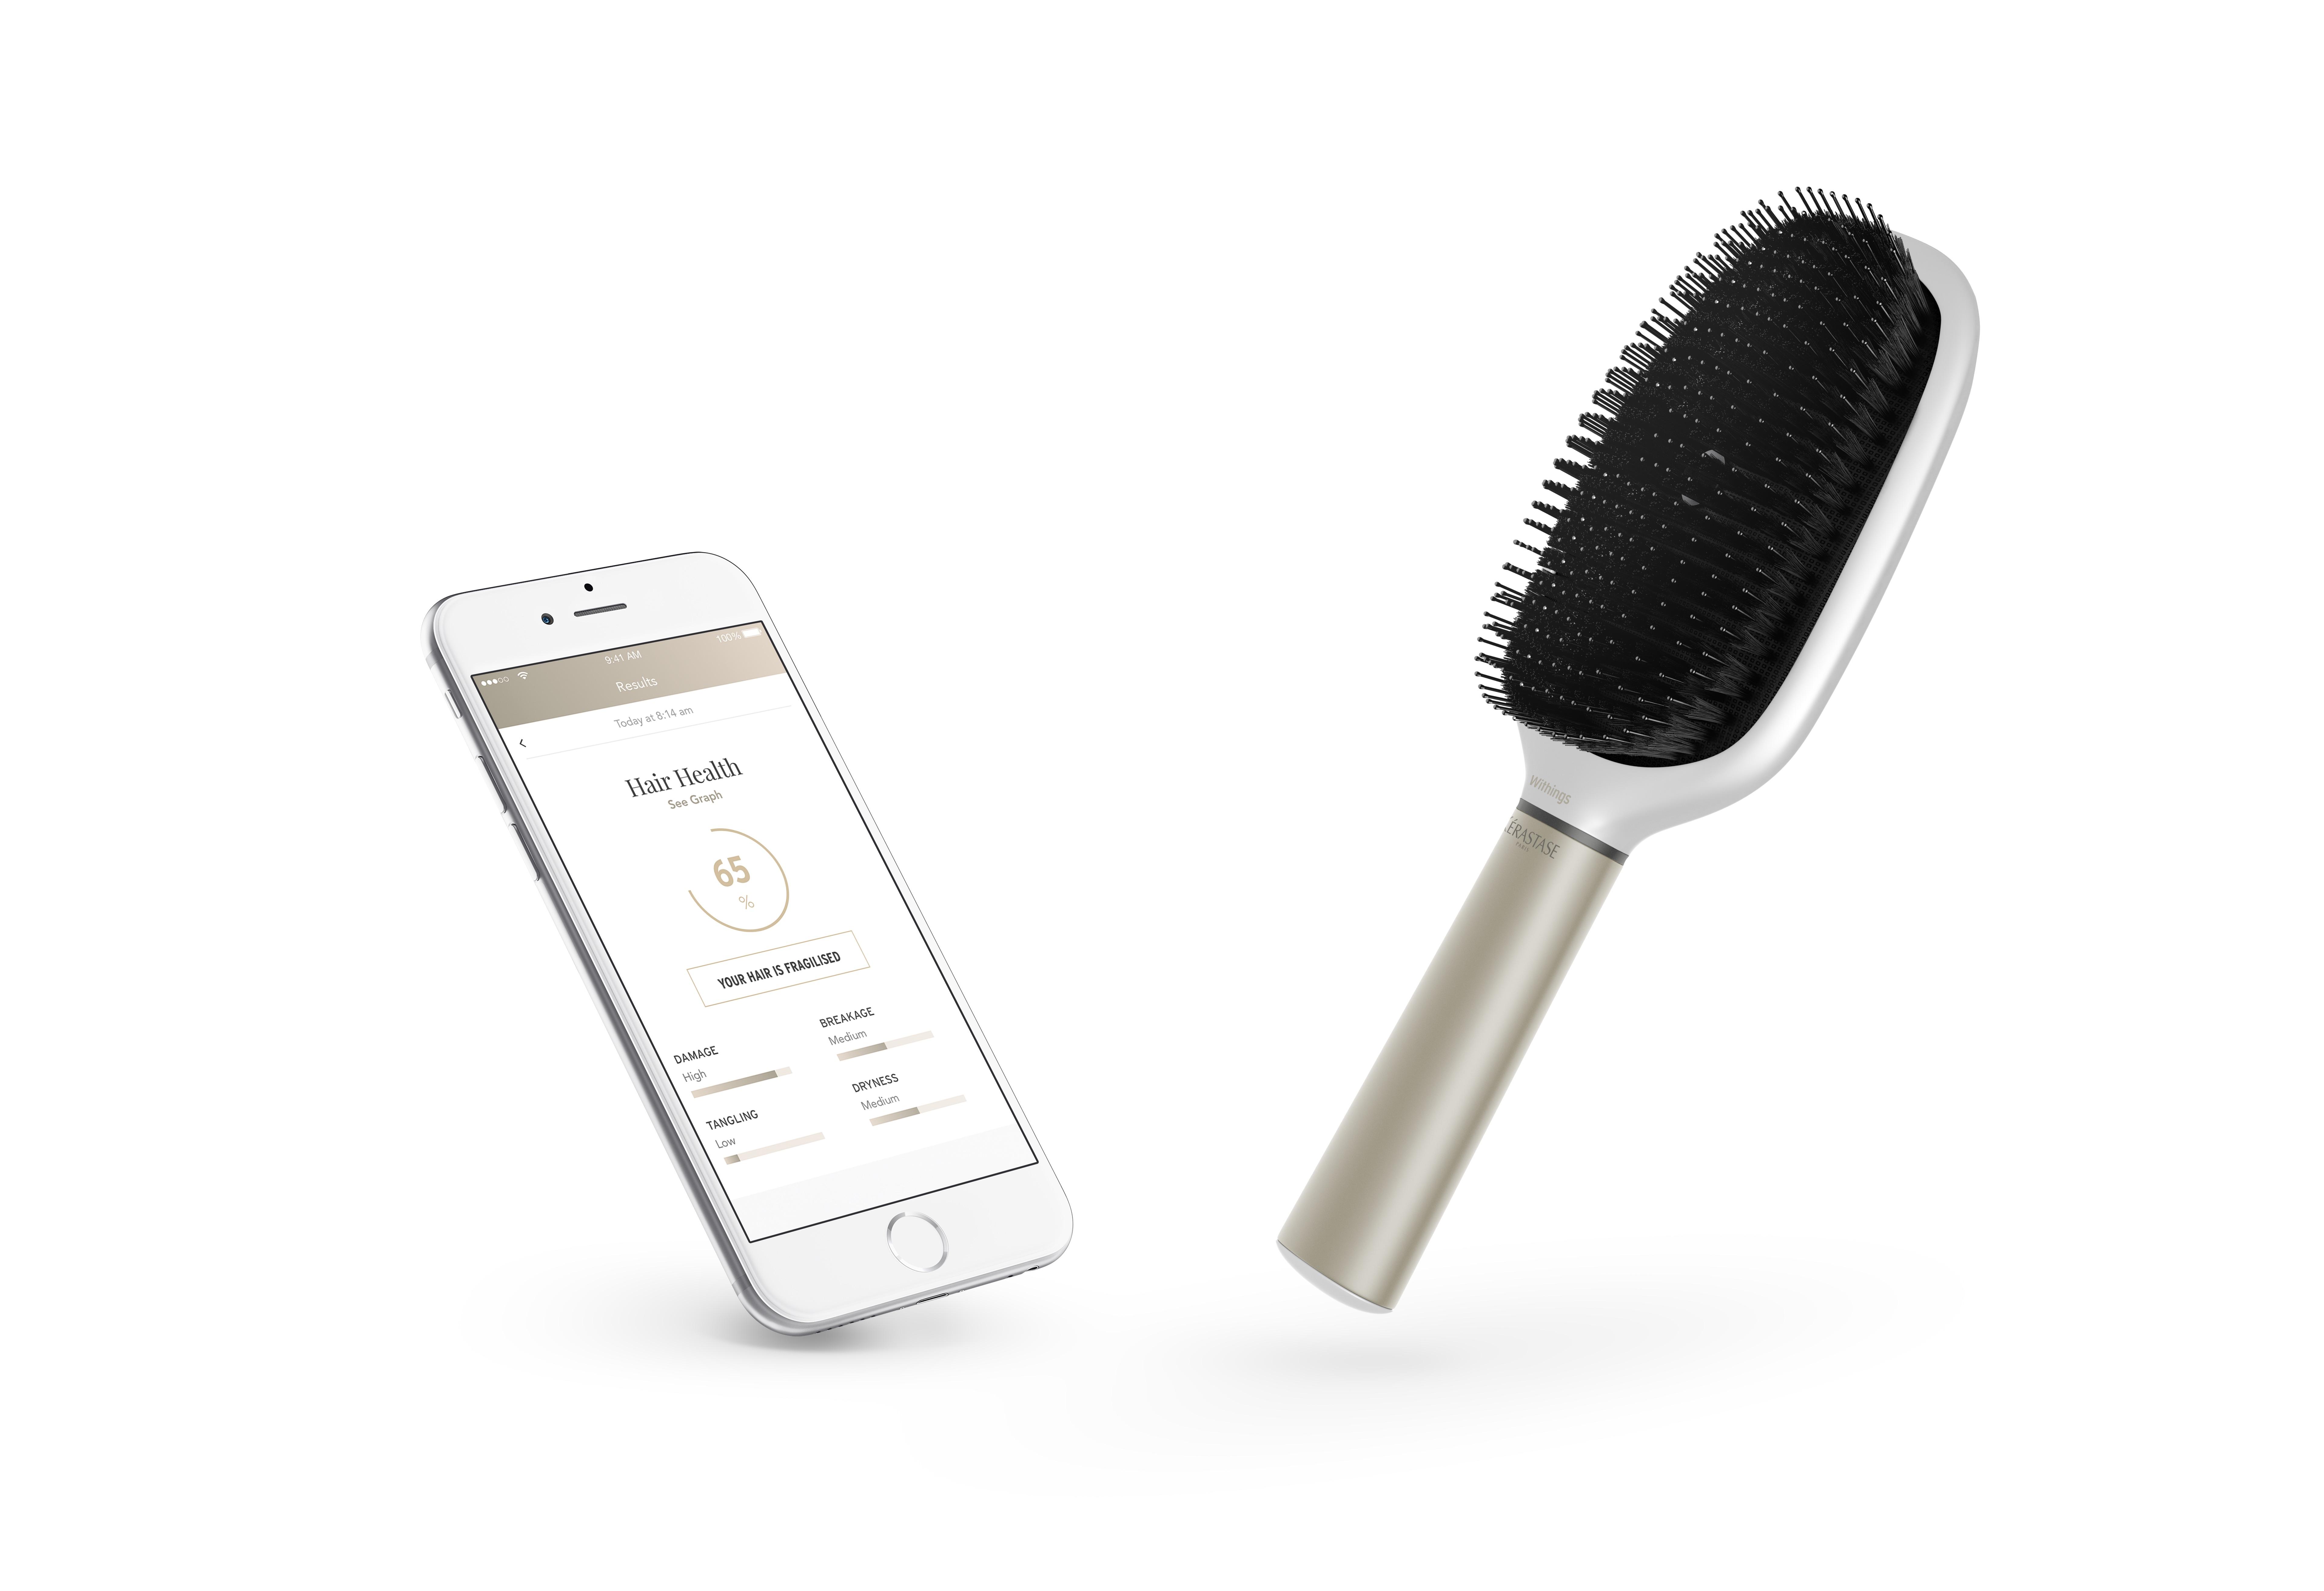 L Oreal S Kérastase Hair Coach App Connected Smart Hairbrush Fortune